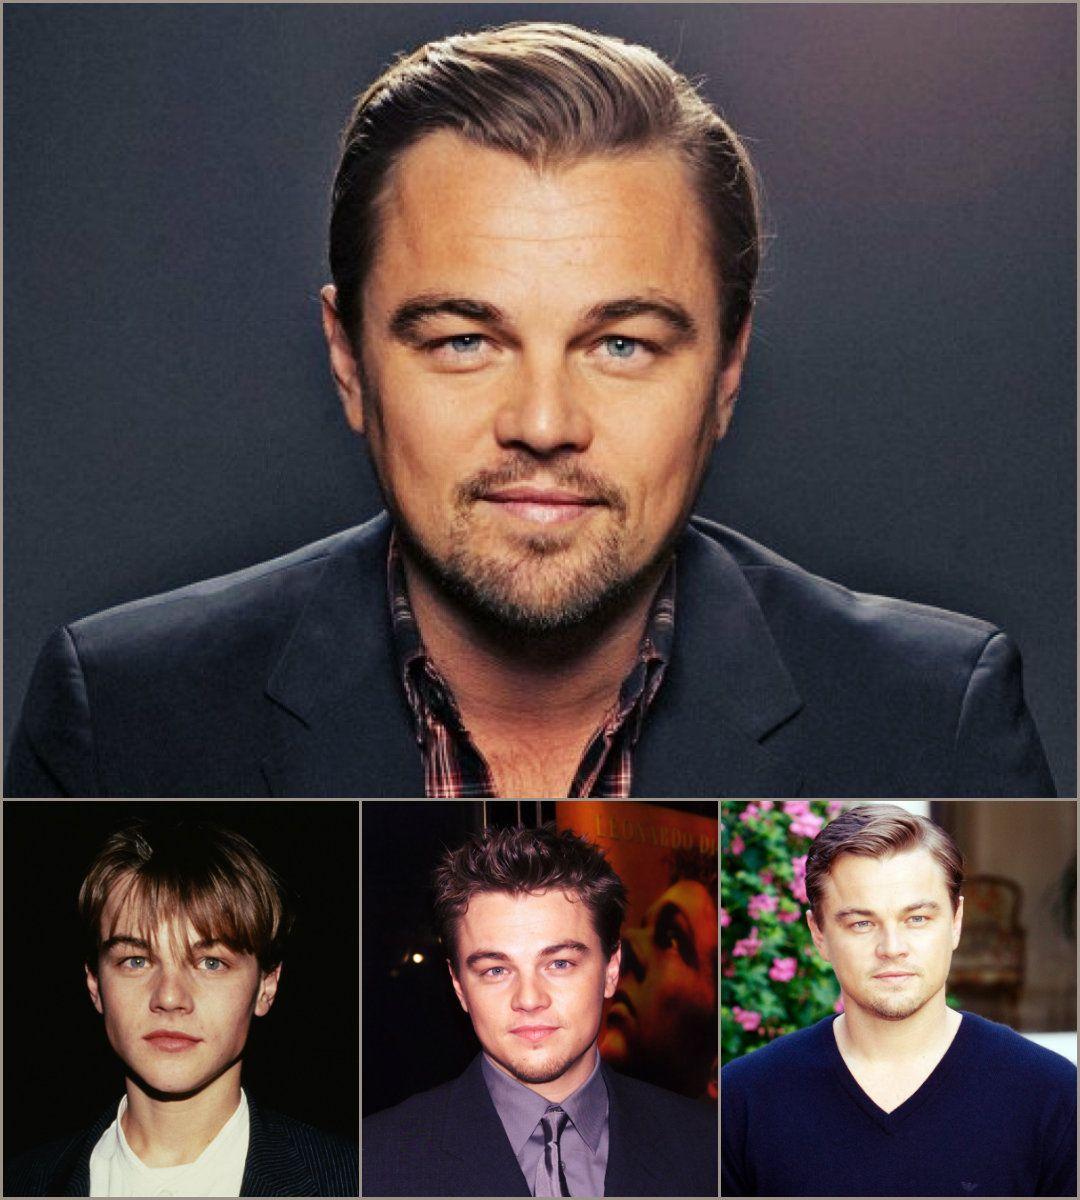 Leonardo DiCaprio Hairstyles Makeover | Hairstyles 2015, Hair ...